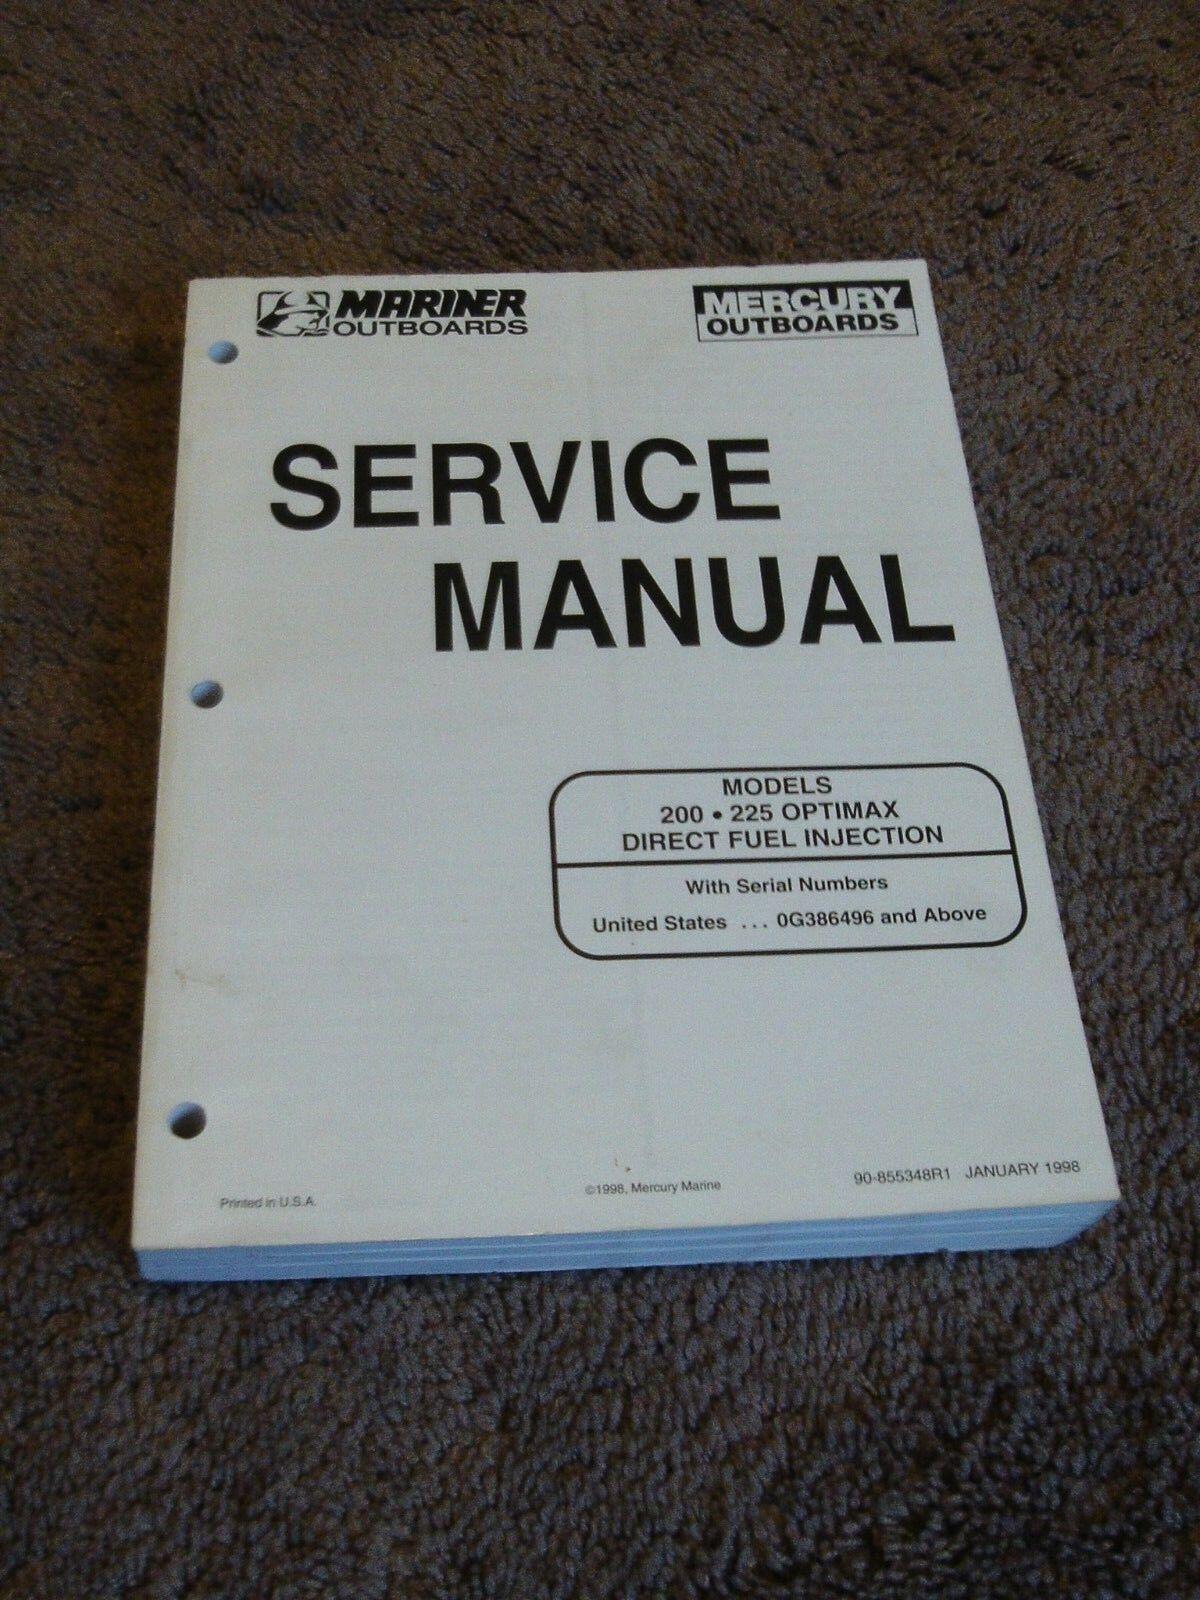 90-855348r1 Mercury Mariner OUTBOARD Service Manual 200-225 DFI Optimax |  eBay